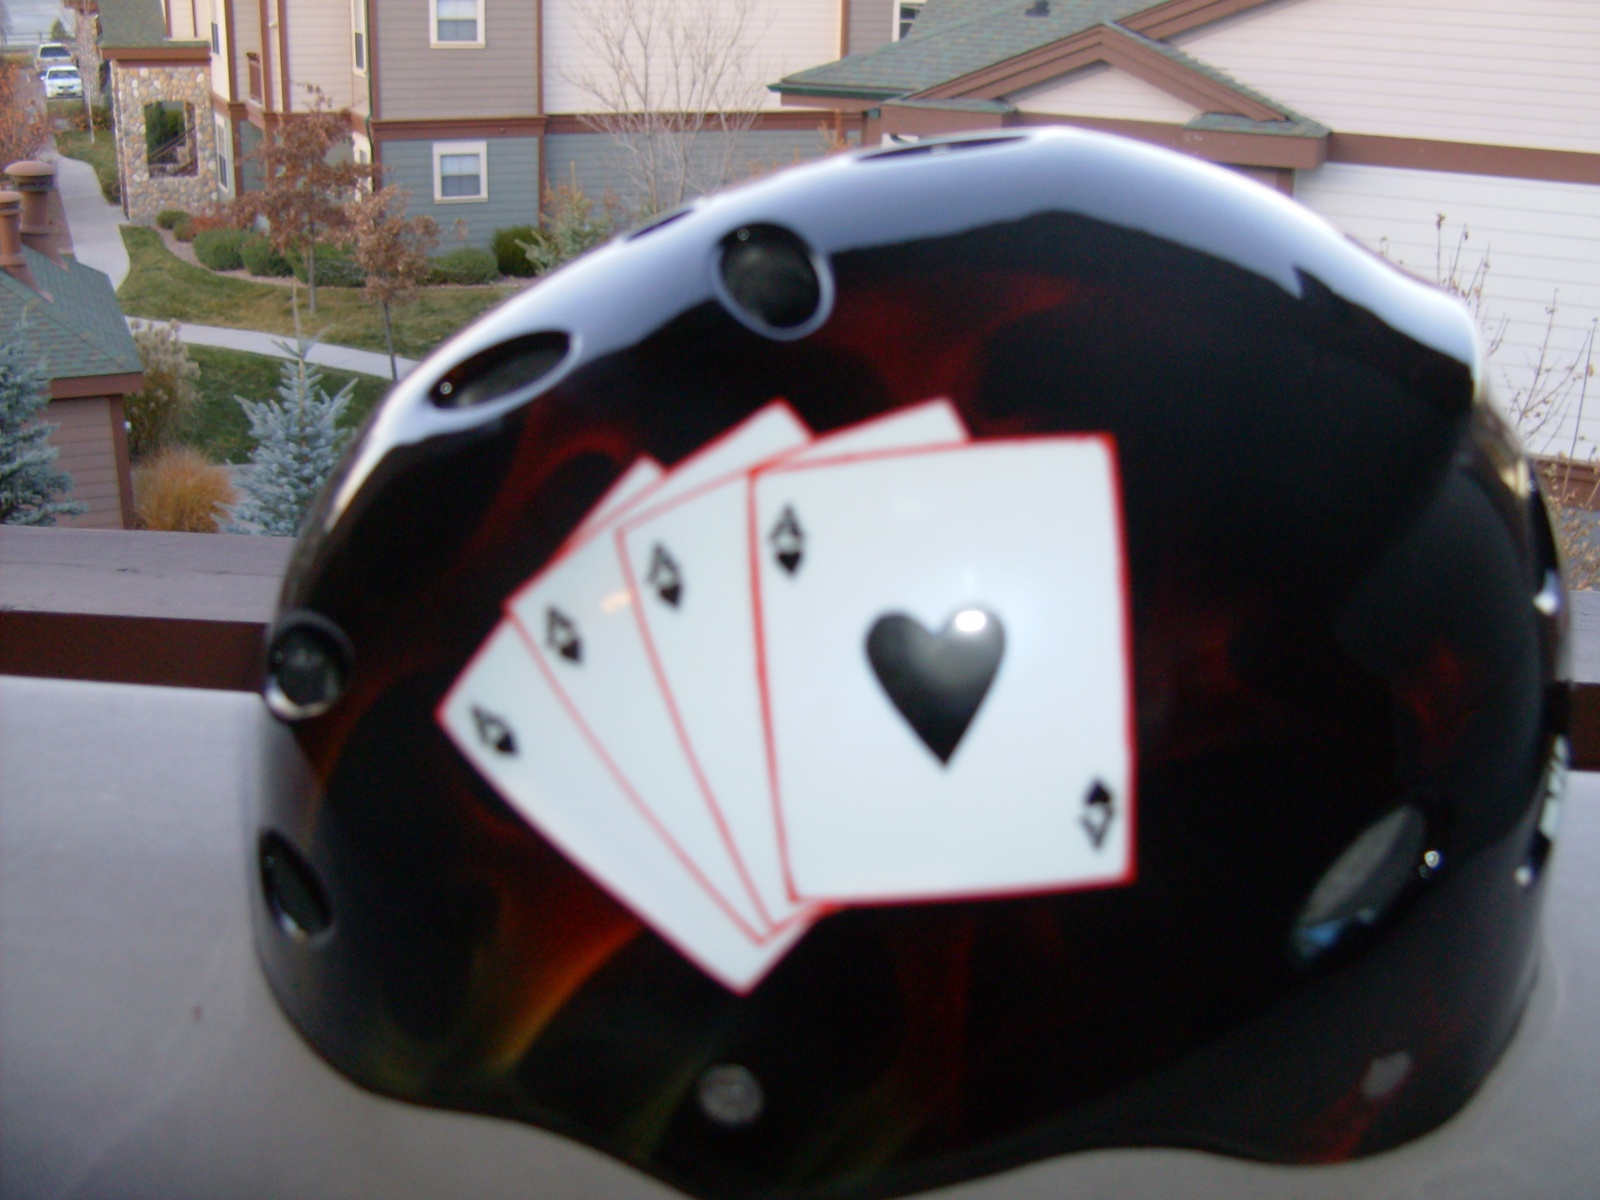 Click image for larger version  Name:Custom kayak helmet 004.jpg Views:165 Size:408.5 KB ID:850